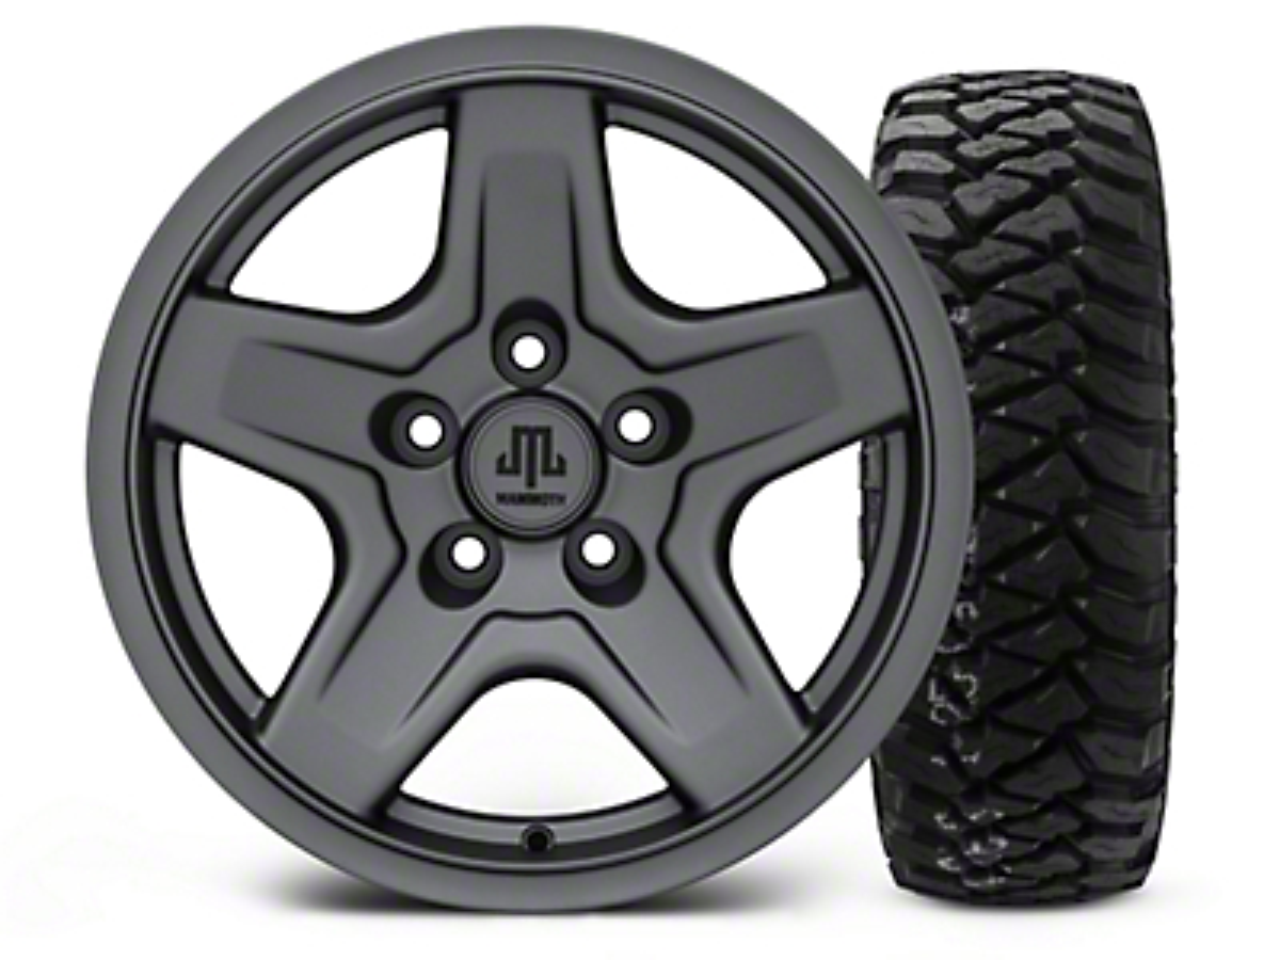 Mammoth Boulder Charcoal 16x8 Wheel & Mickey Thompson Baja MTZP3 285/75R16 Tire Kit (87-06 Jeep Wrangler YJ & TJ)